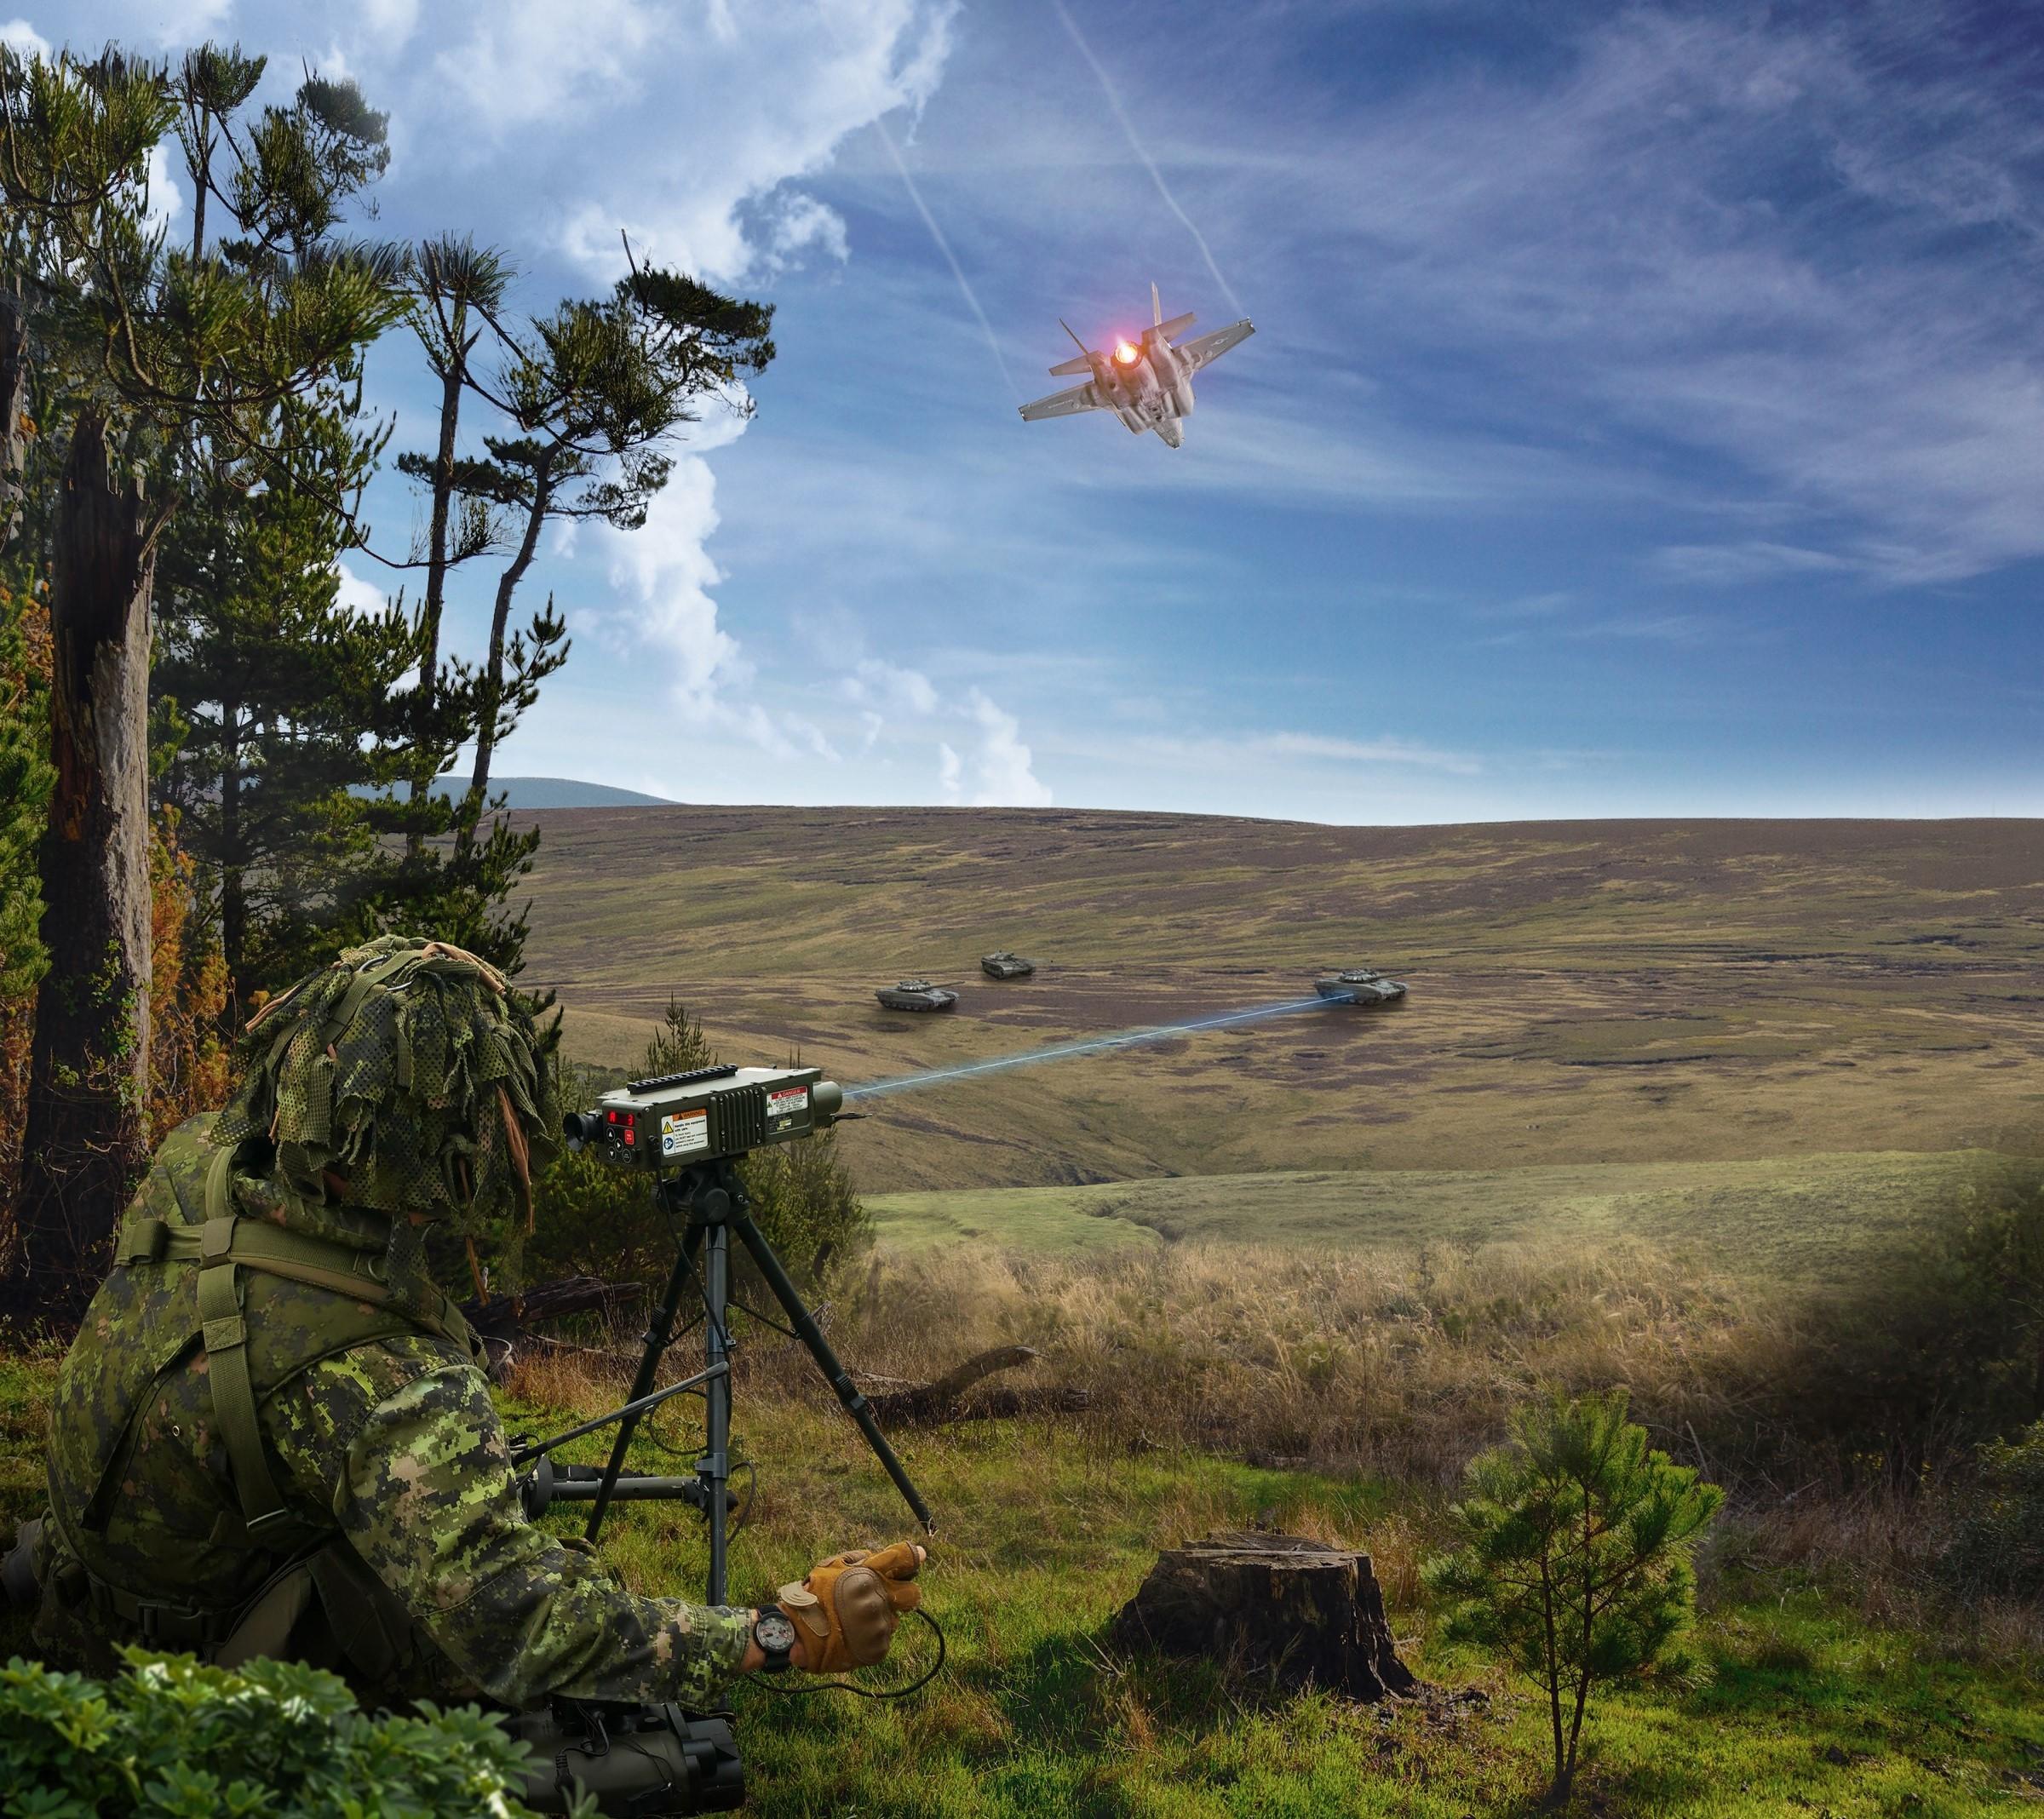 _Type 163 laser target designator LTD_ (002)